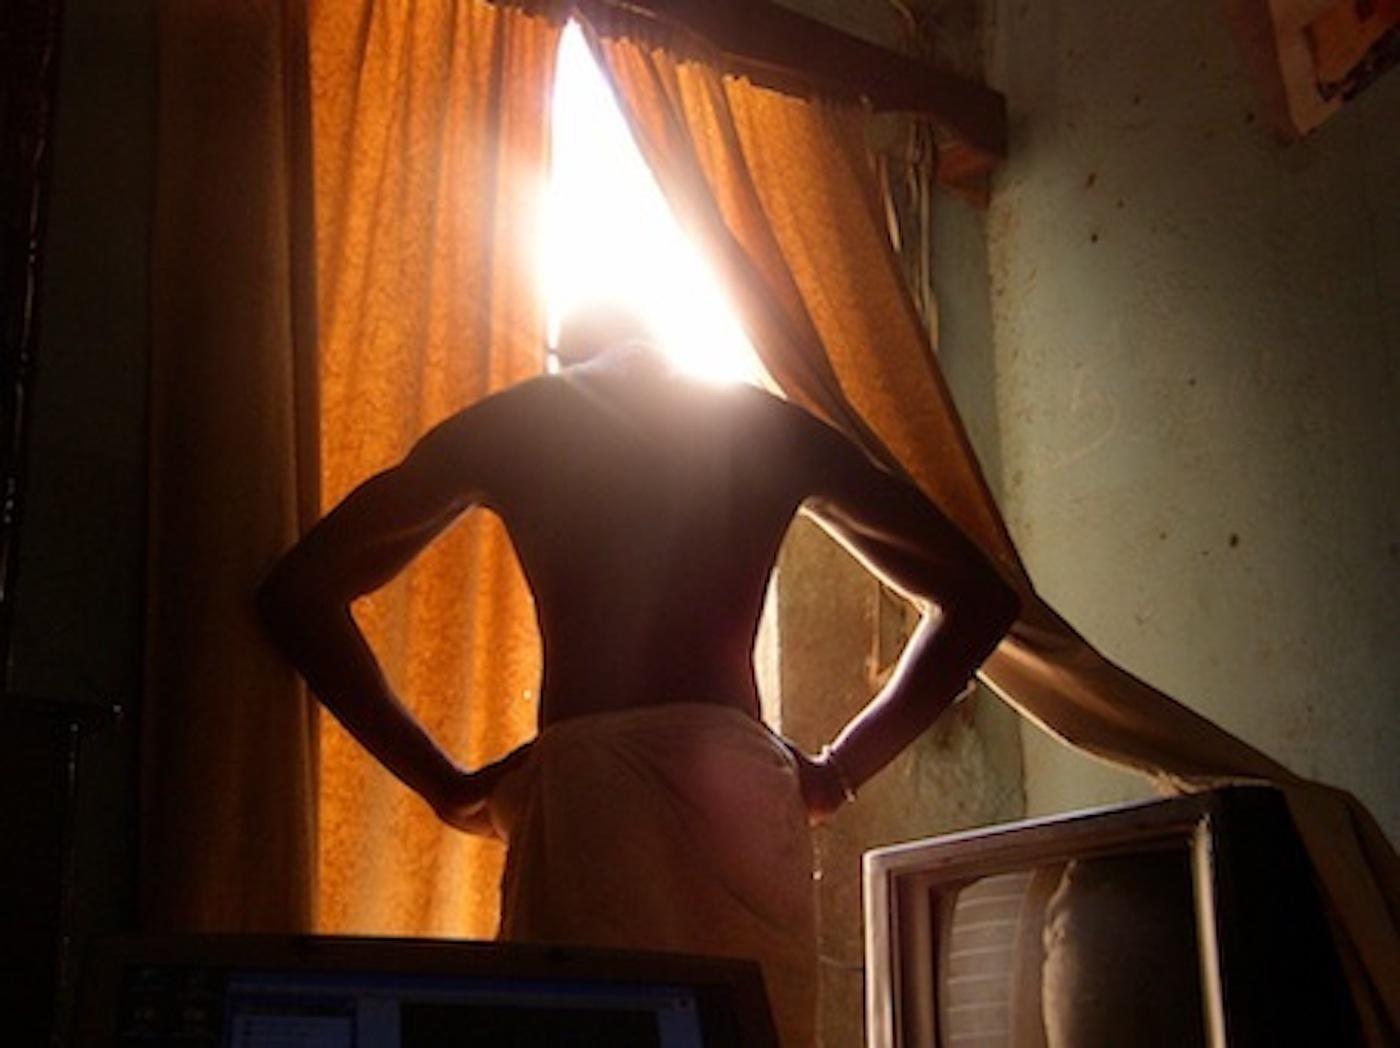 "Mohamed Camara, ""Certains matins, j'ai la tête dans le cul"" 2006/7,digital c-print,  48 x 58 cm. (framed),"